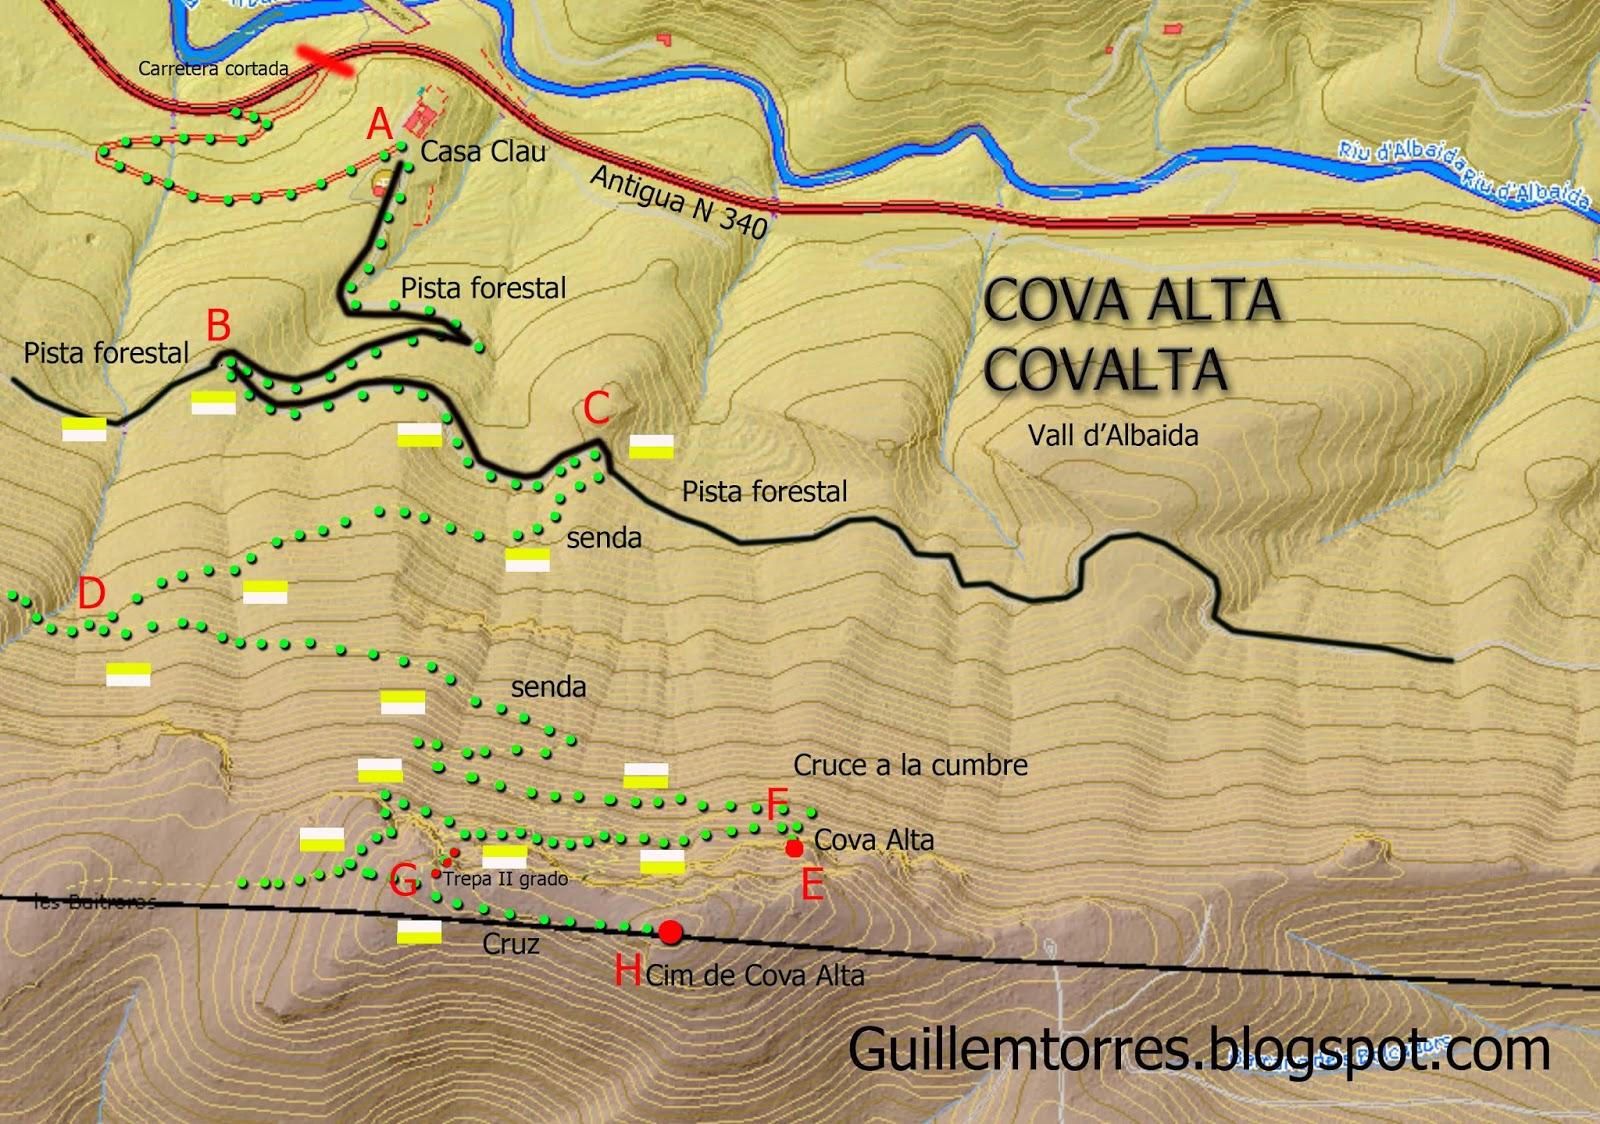 Croquis cova alta vall d'albaida